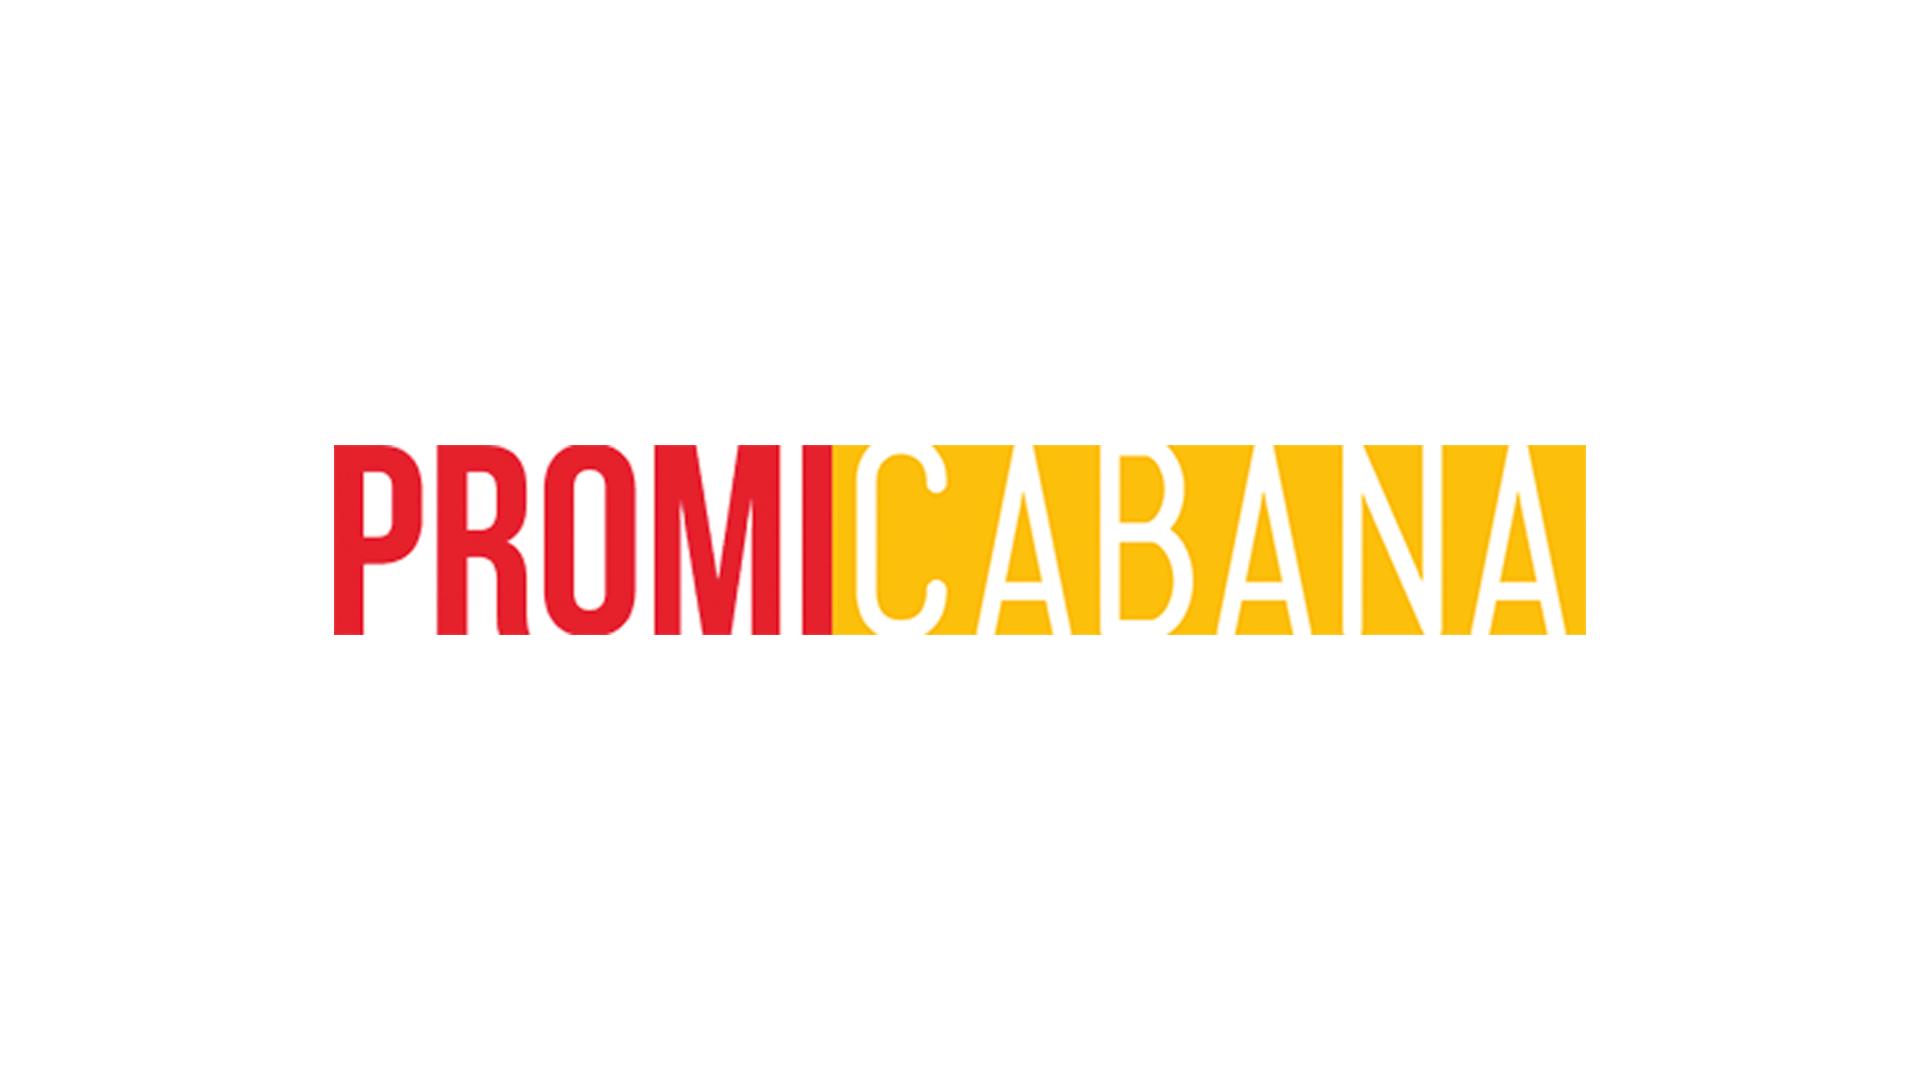 Dirty-Dancing-Remake-Be-My-Baby-Musikvideo-Bea-Miller